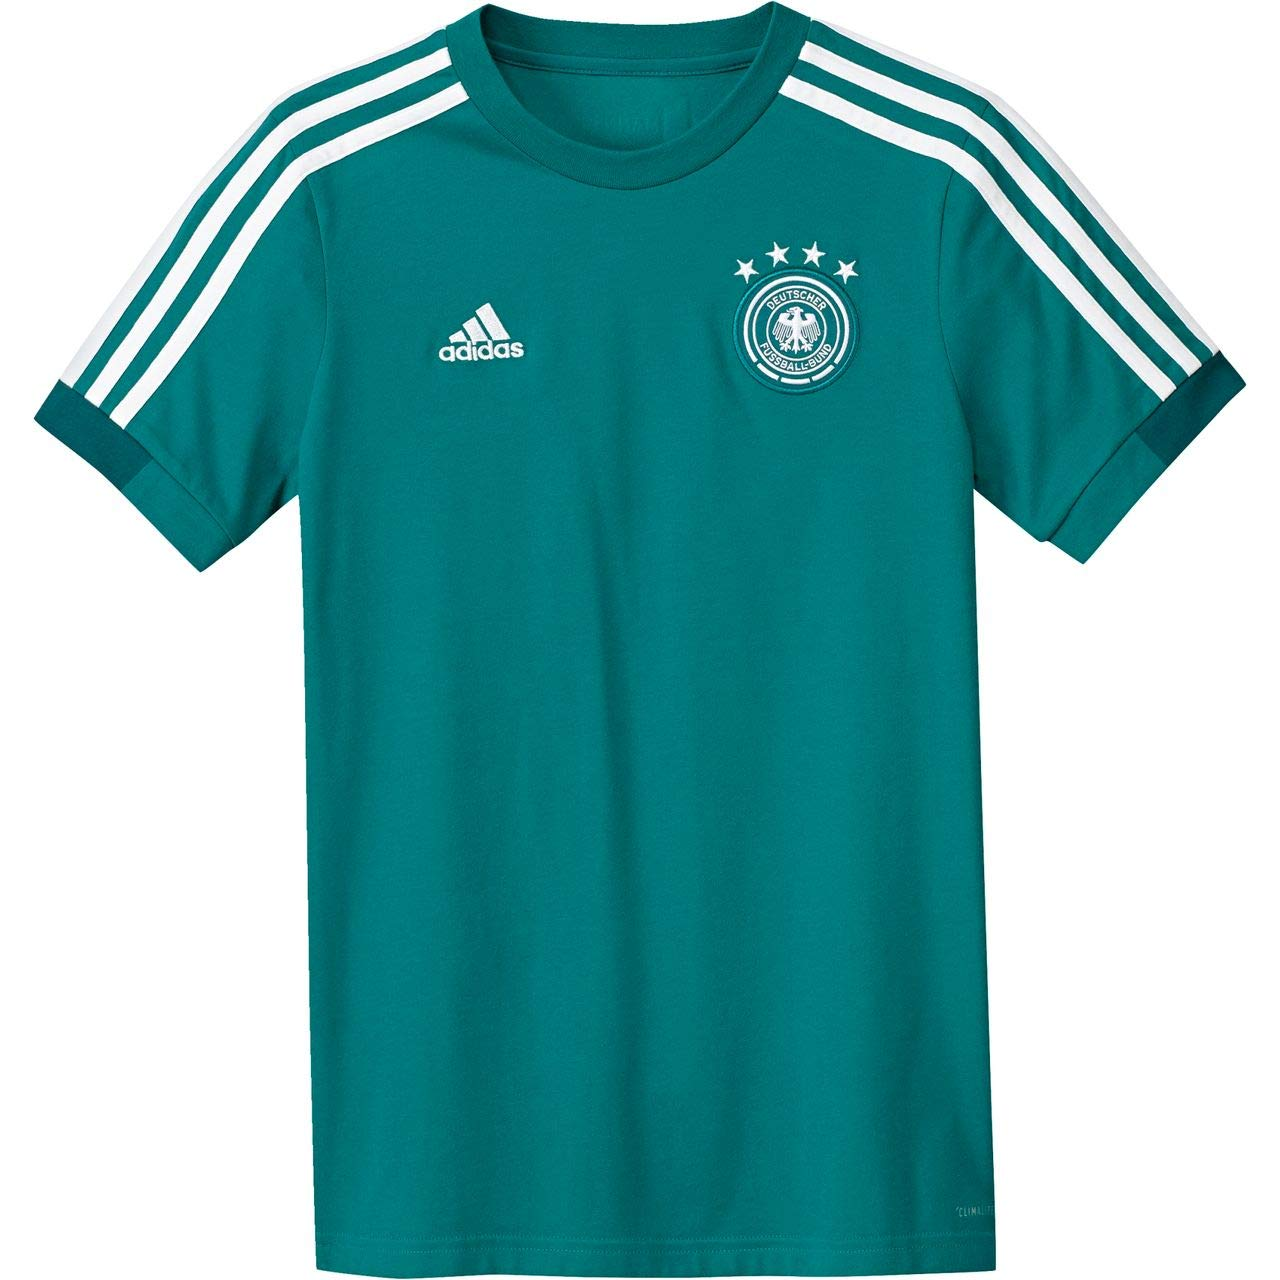 43f4e30f7d4 adidas Children's Dfb Tee T-Shirt: Amazon.co.uk: Sports & Outdoors